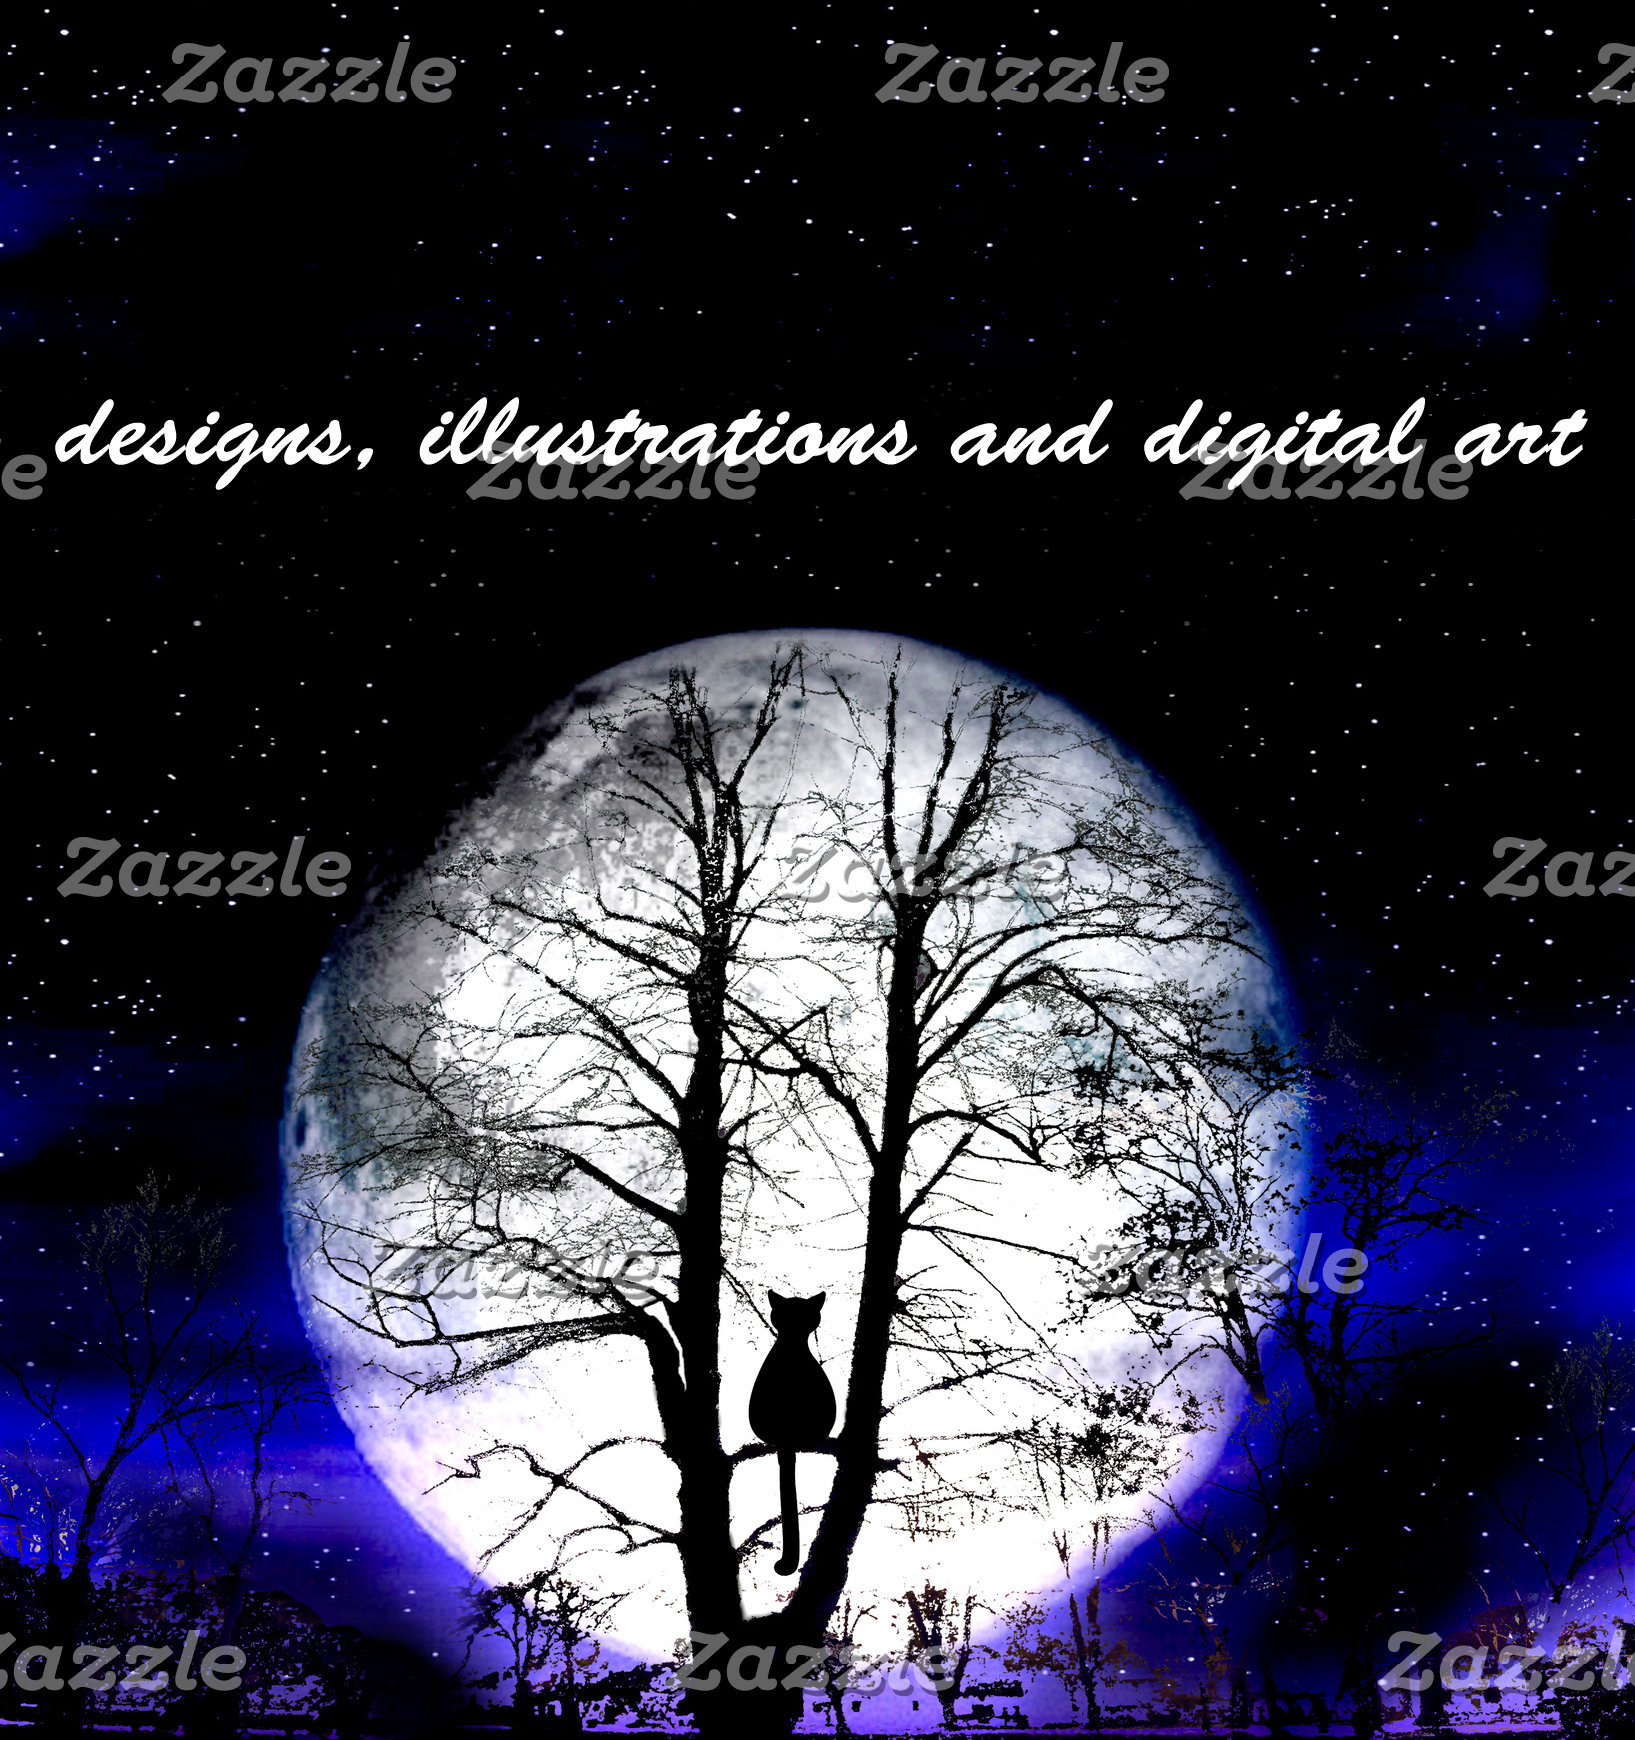 designs, illustrations and digital art